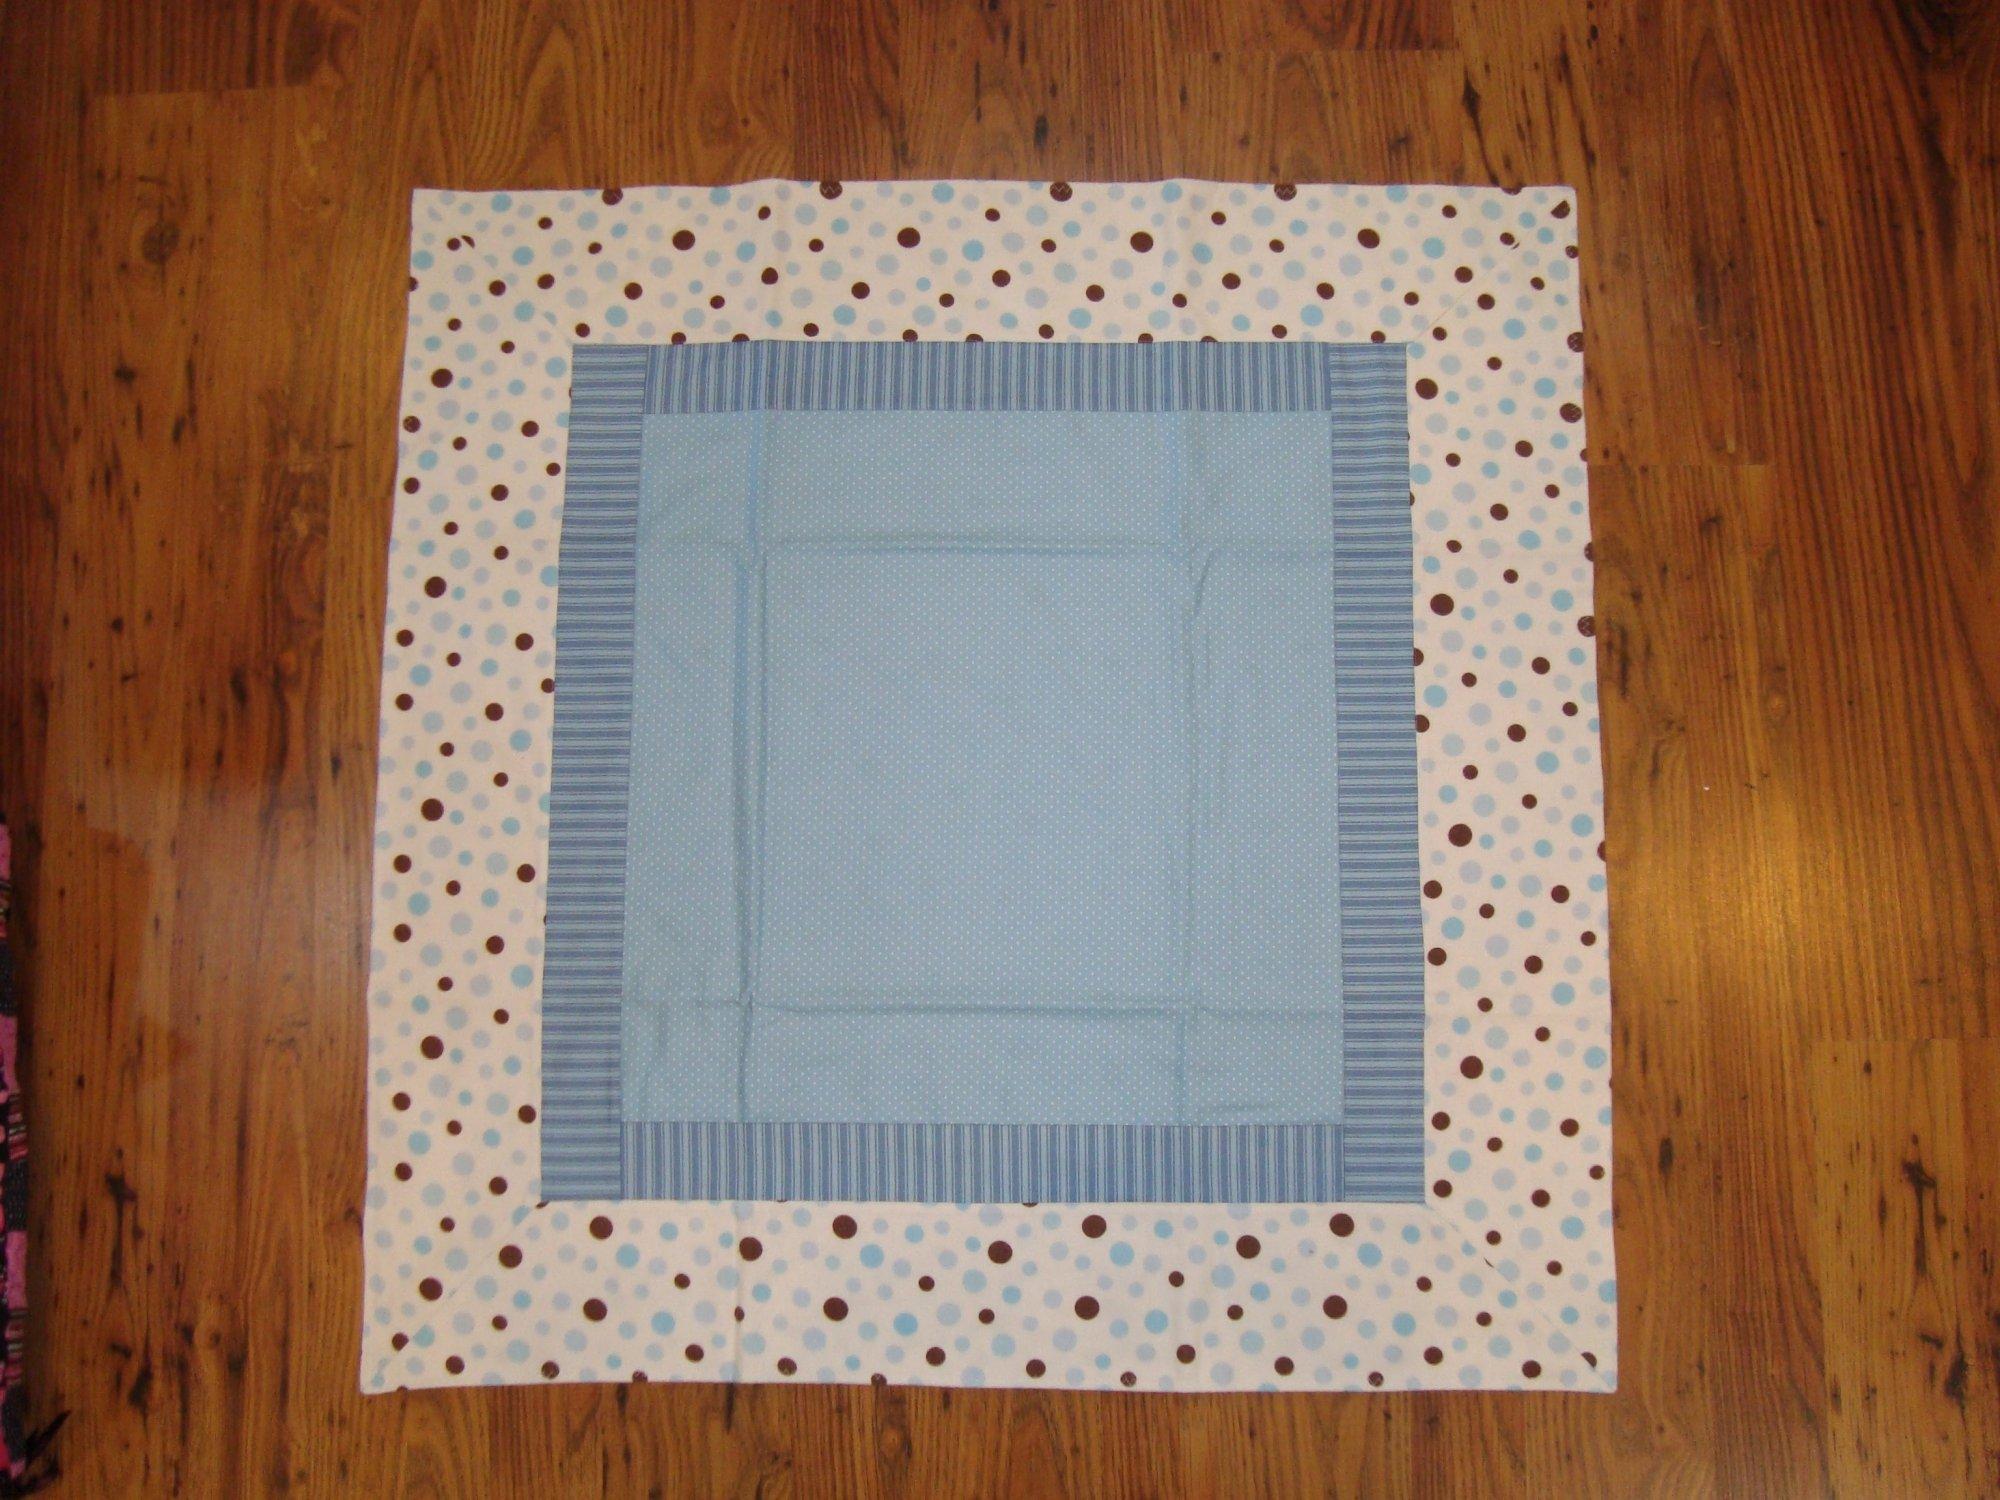 4 B's Baby Blanket Pattern Download - RRQ Original